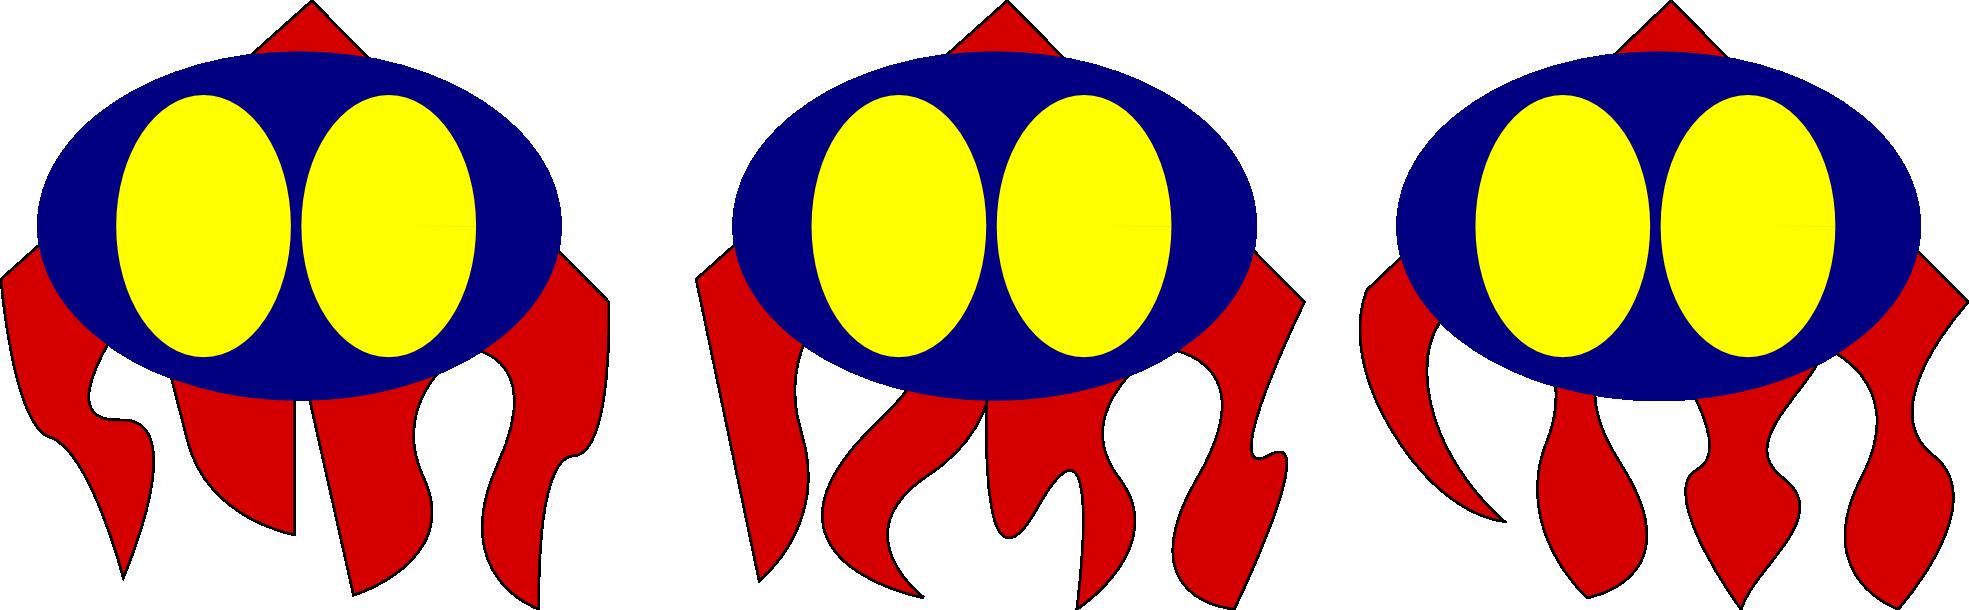 Clipartist net clip art. Geometry clipart icon